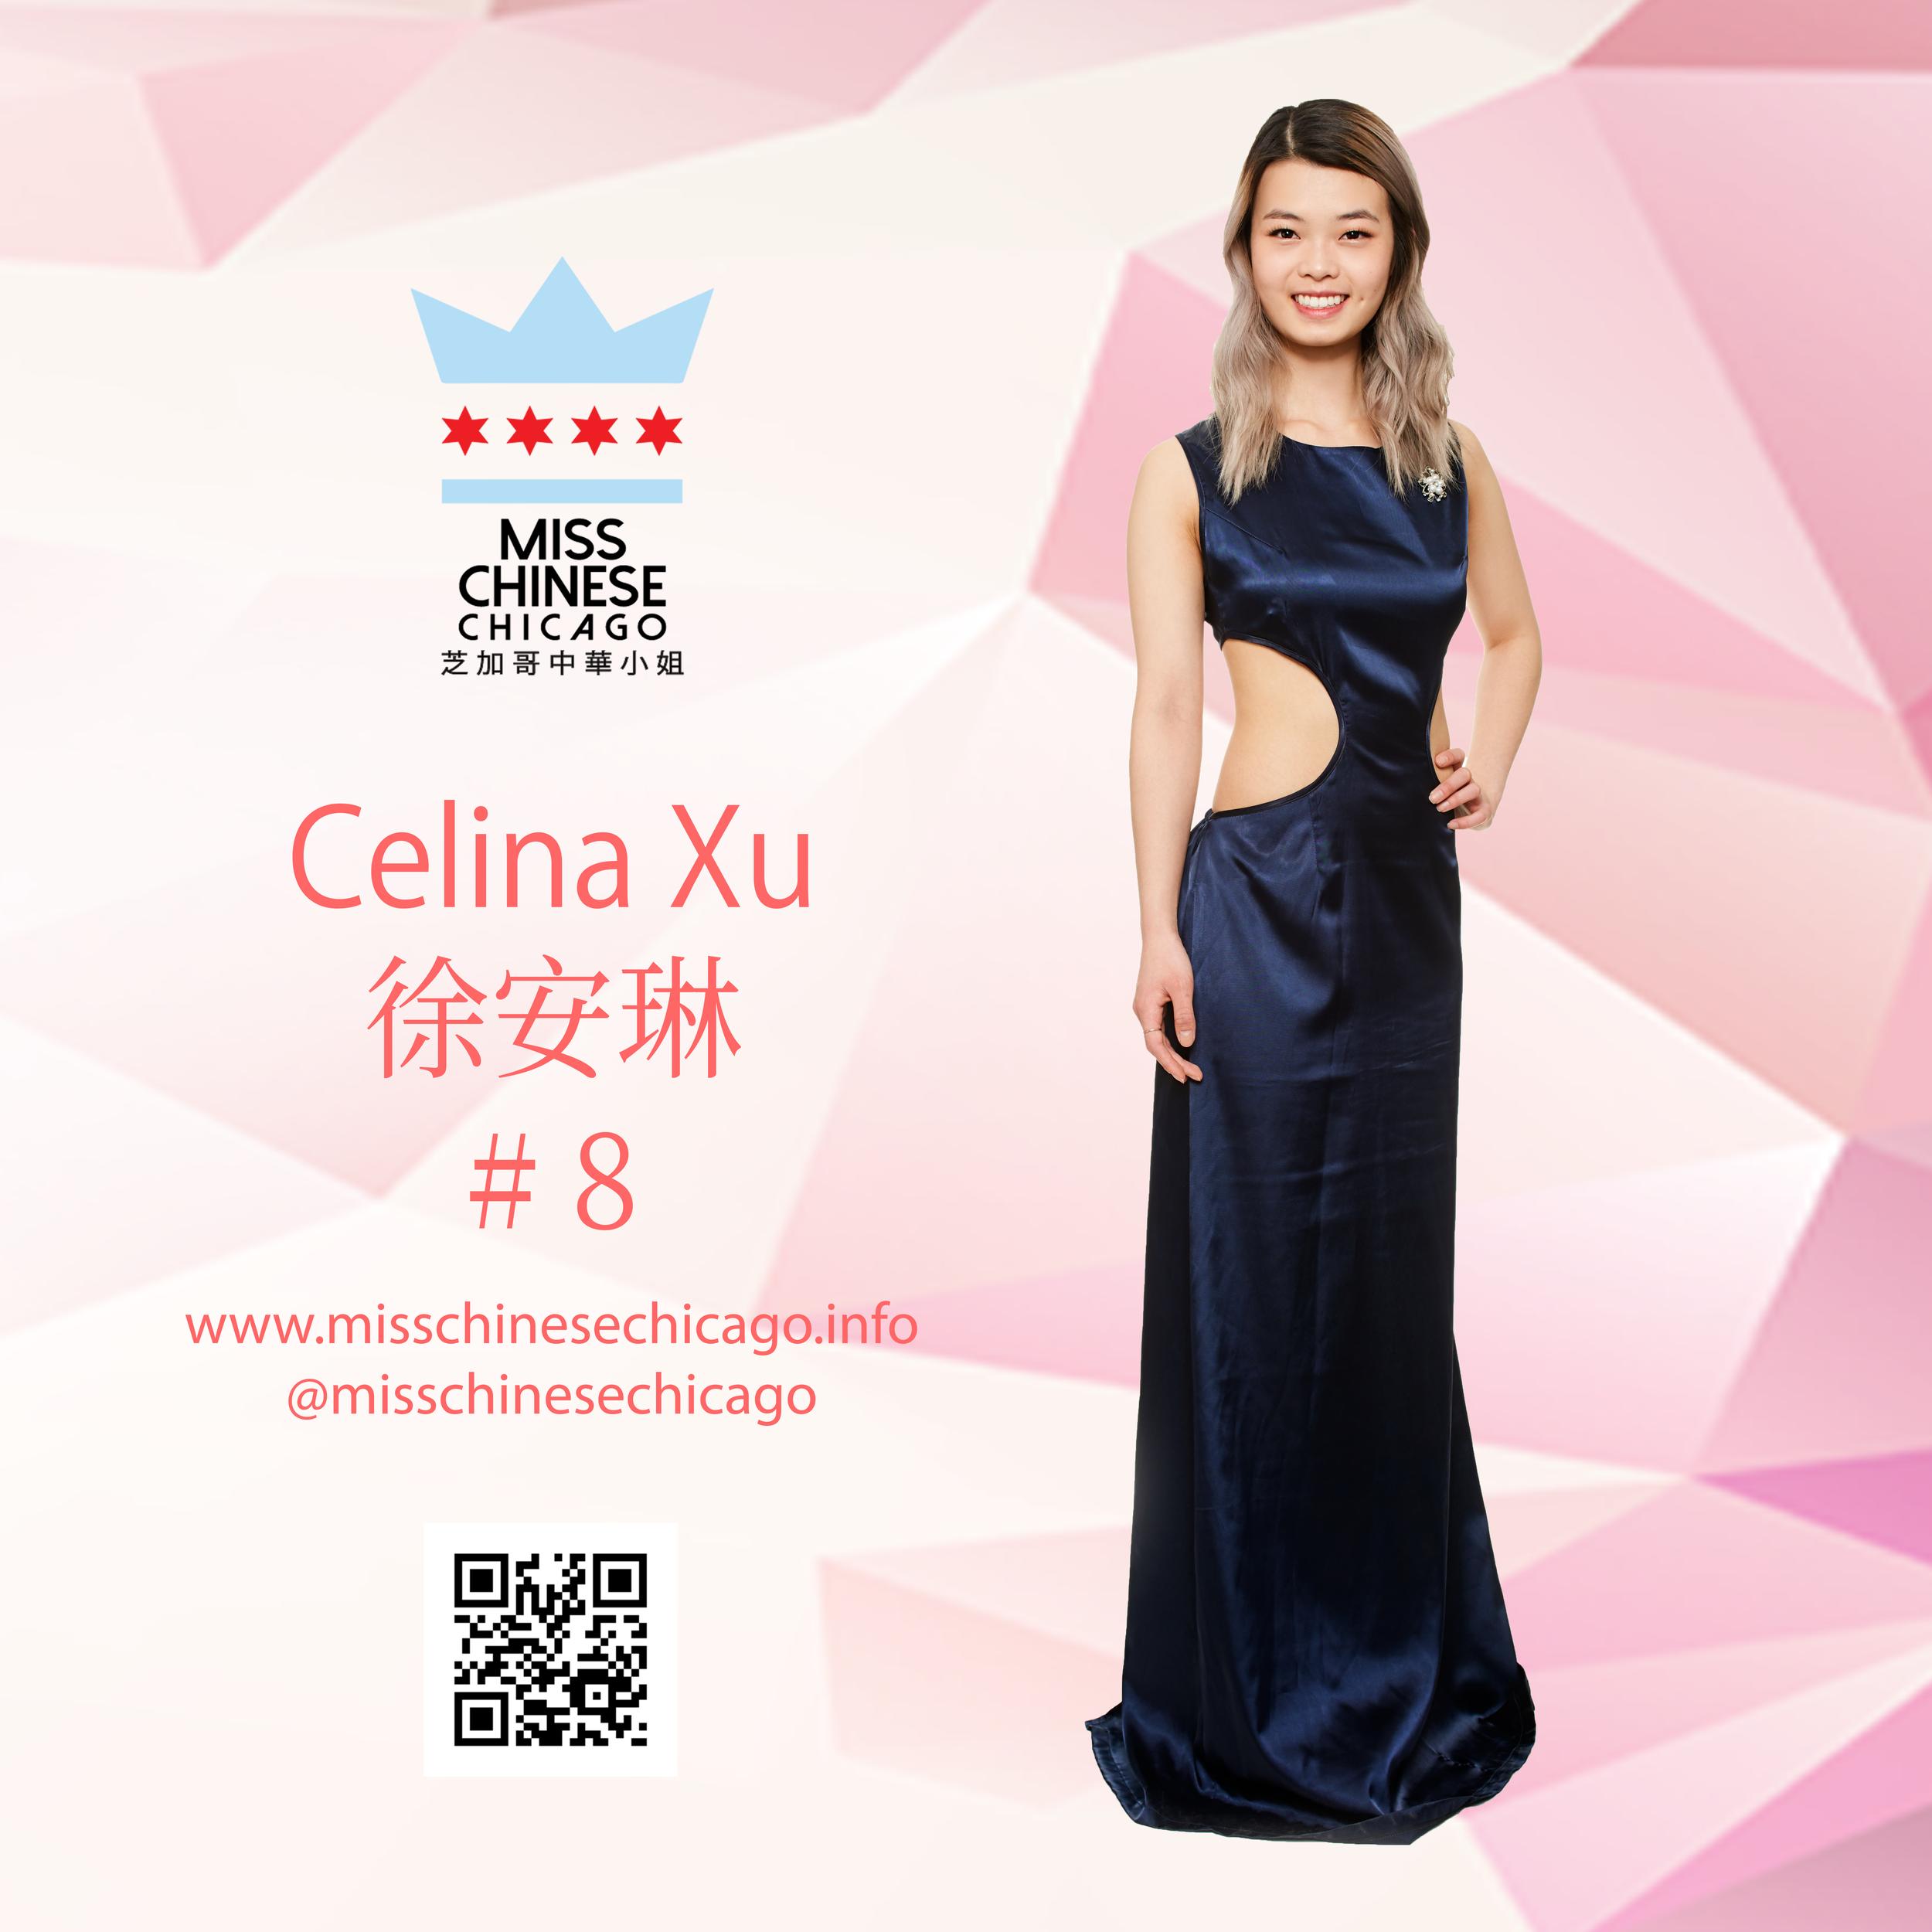 Celina Xu 2019 Contestant